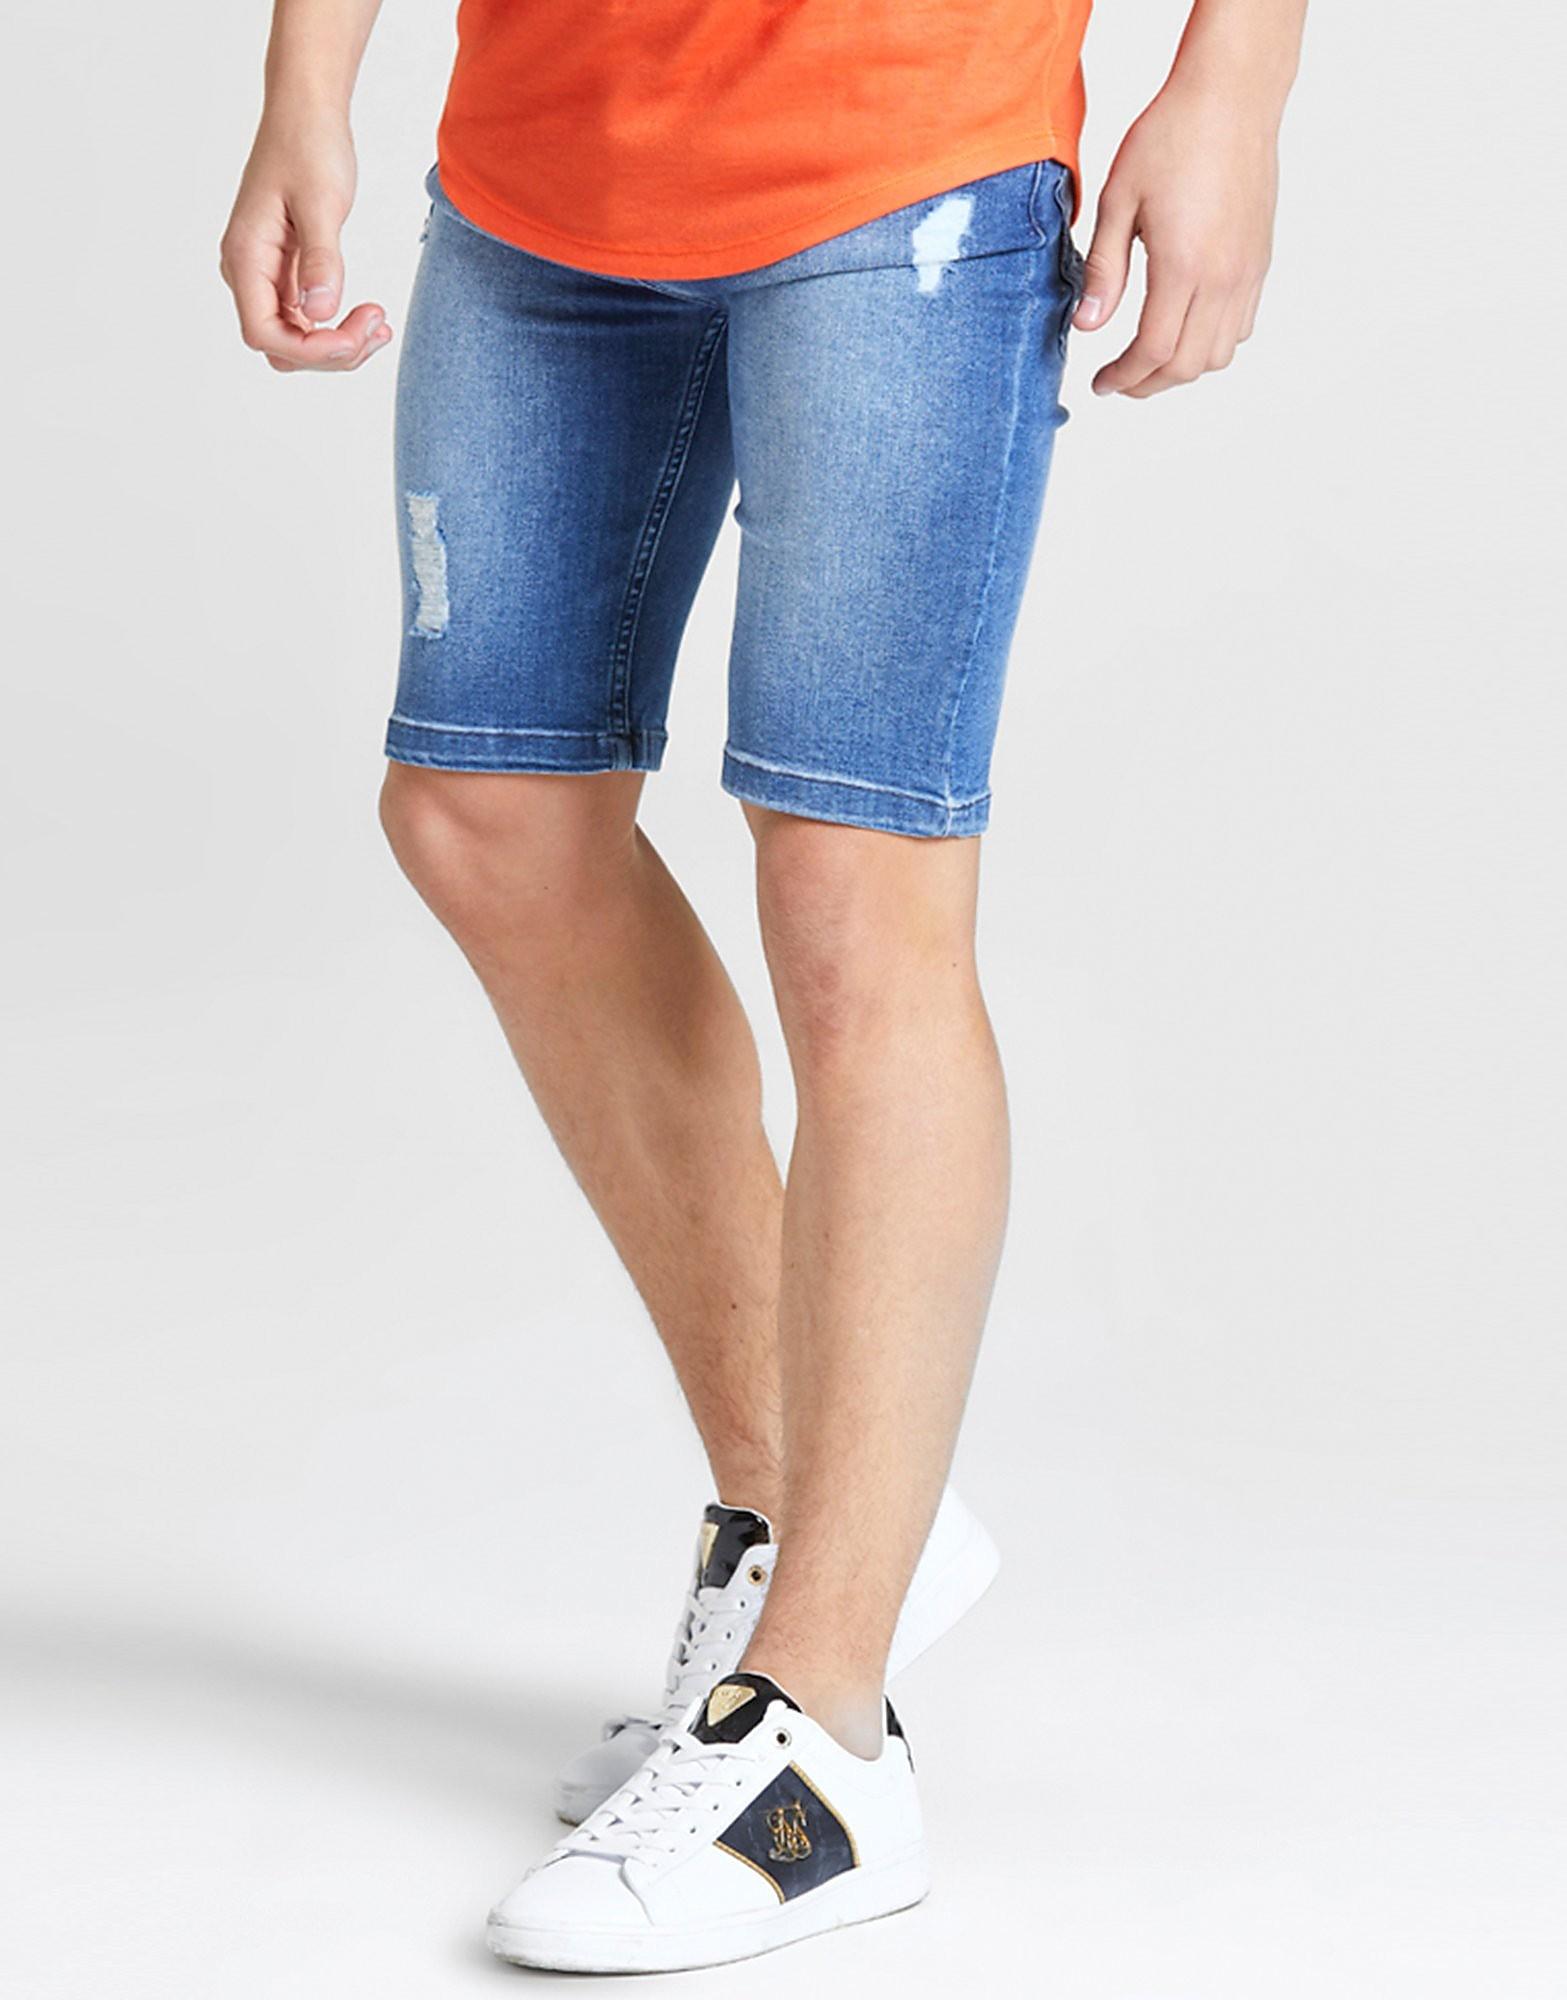 ILLUSIVE LONDON Denim Shorts Junior Blauw Kind Blauw